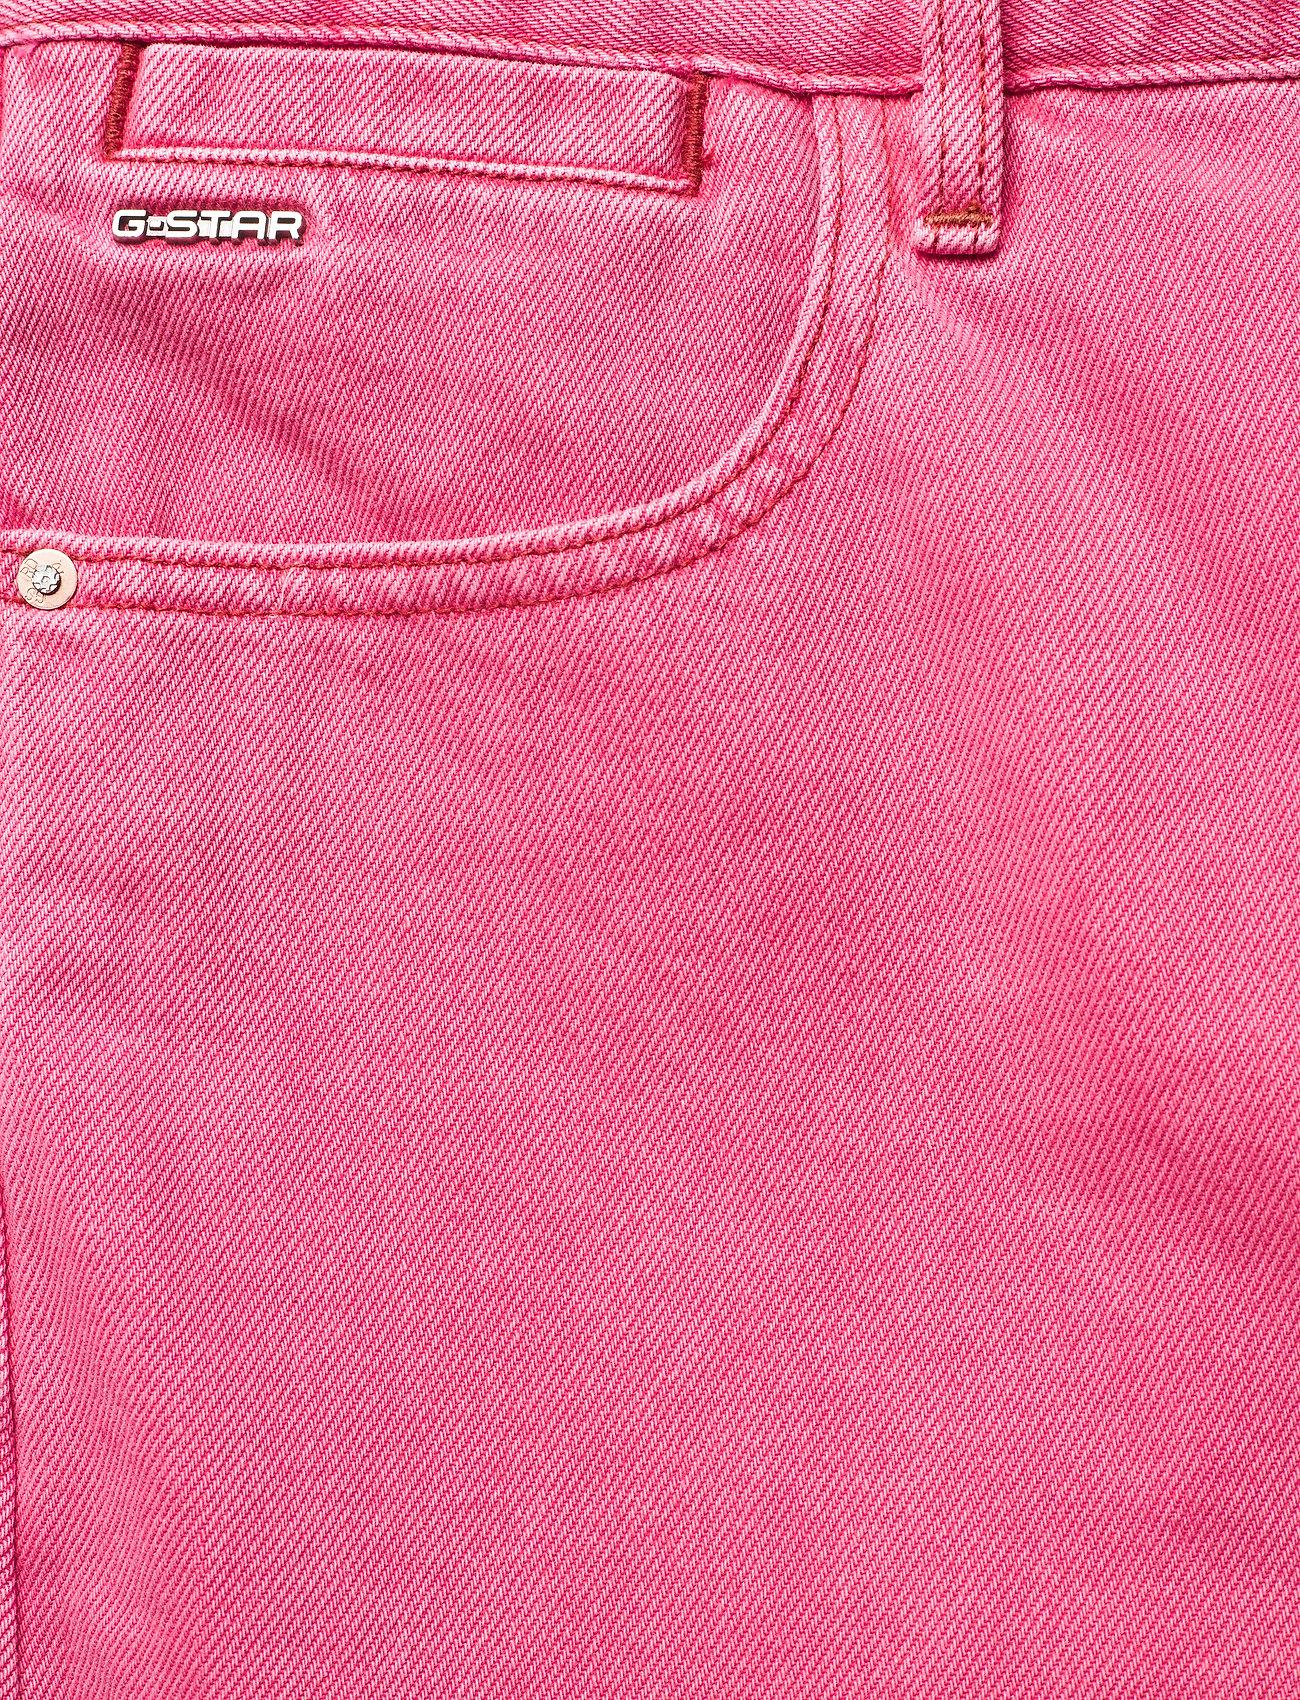 G-star RAW - Tedie Ultra High Long Straight Wmn - straight regular - recycrom petunia pink gd - 3